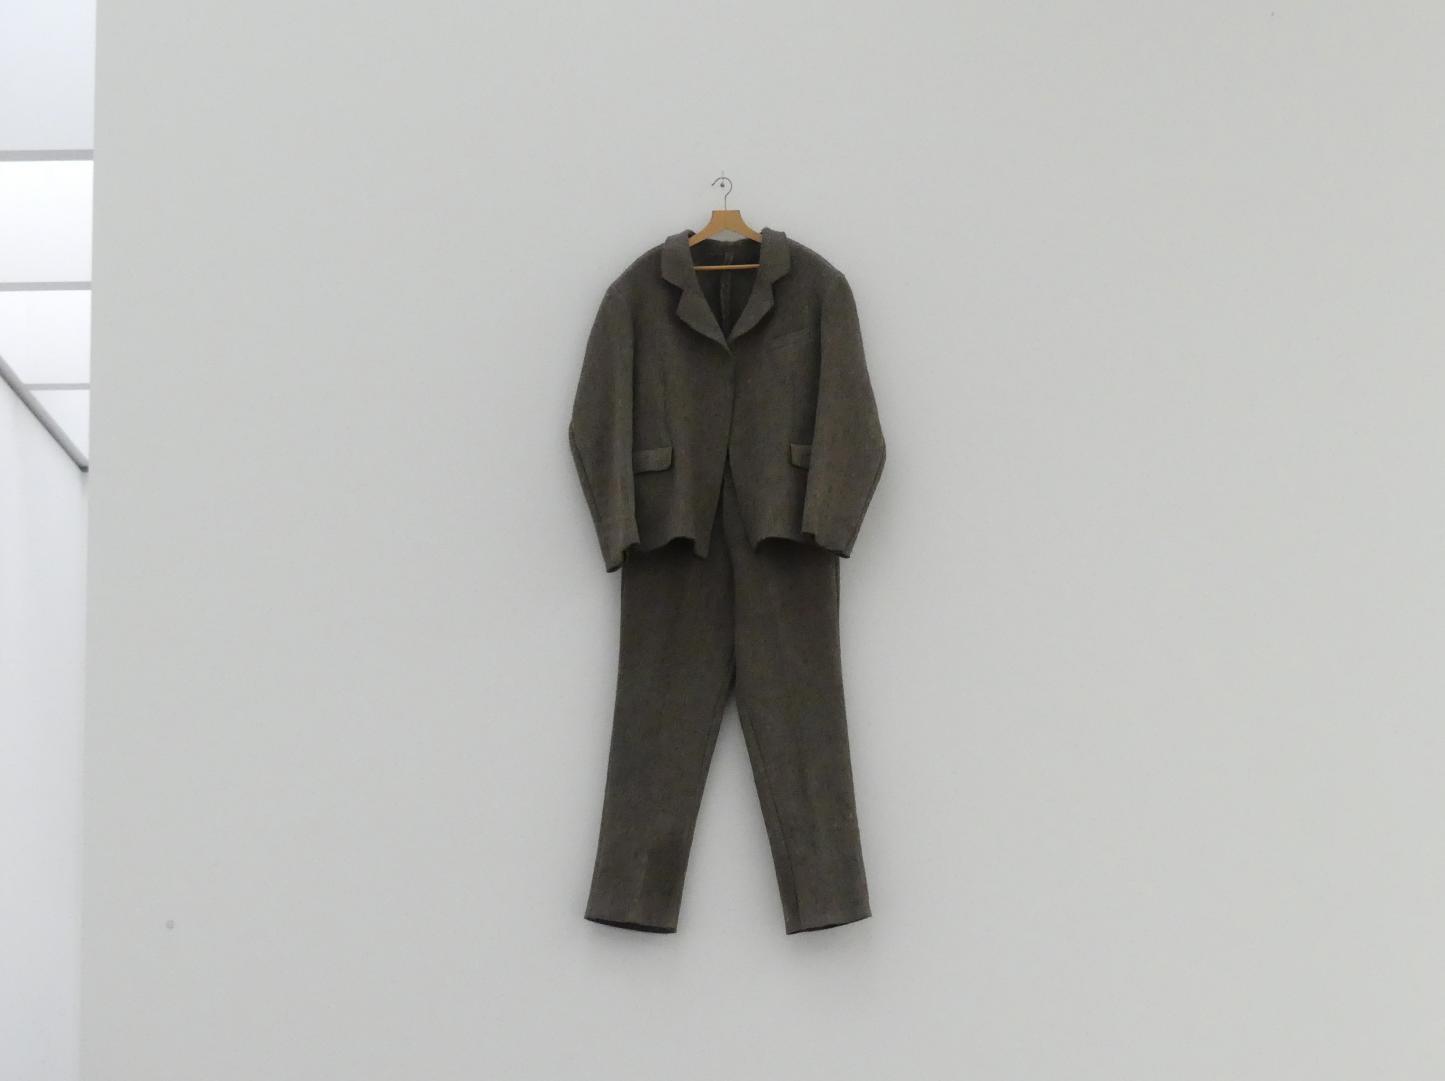 Joseph Beuys: Filzanzug, 1970